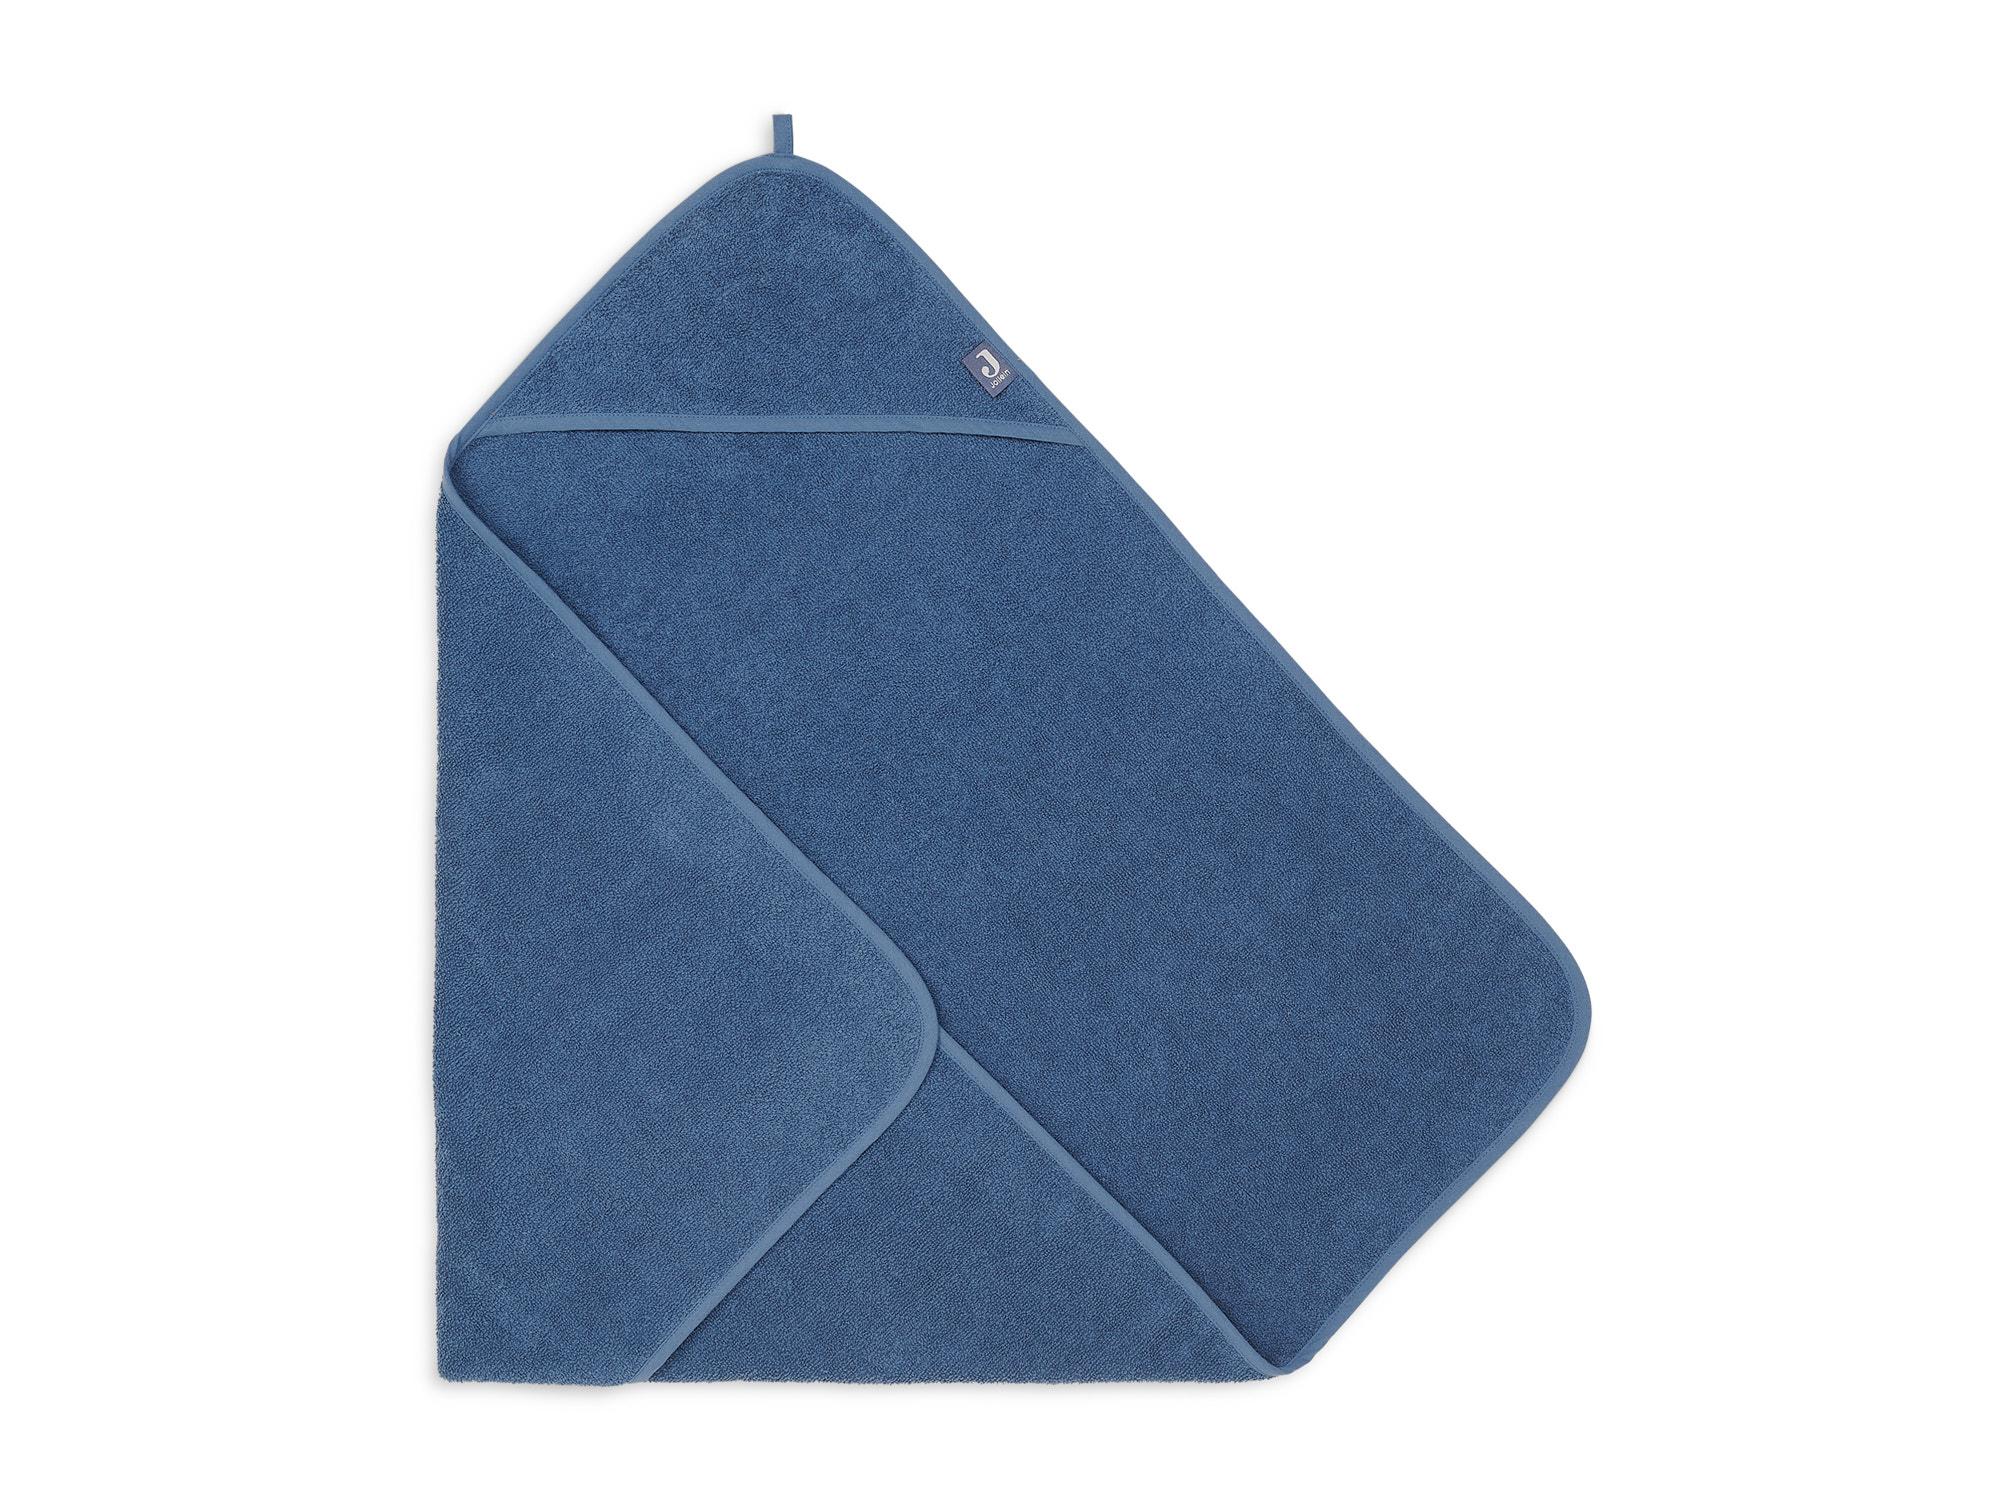 Afbeelding Jollein Badcape badstof 75x75cm I Jeans blue